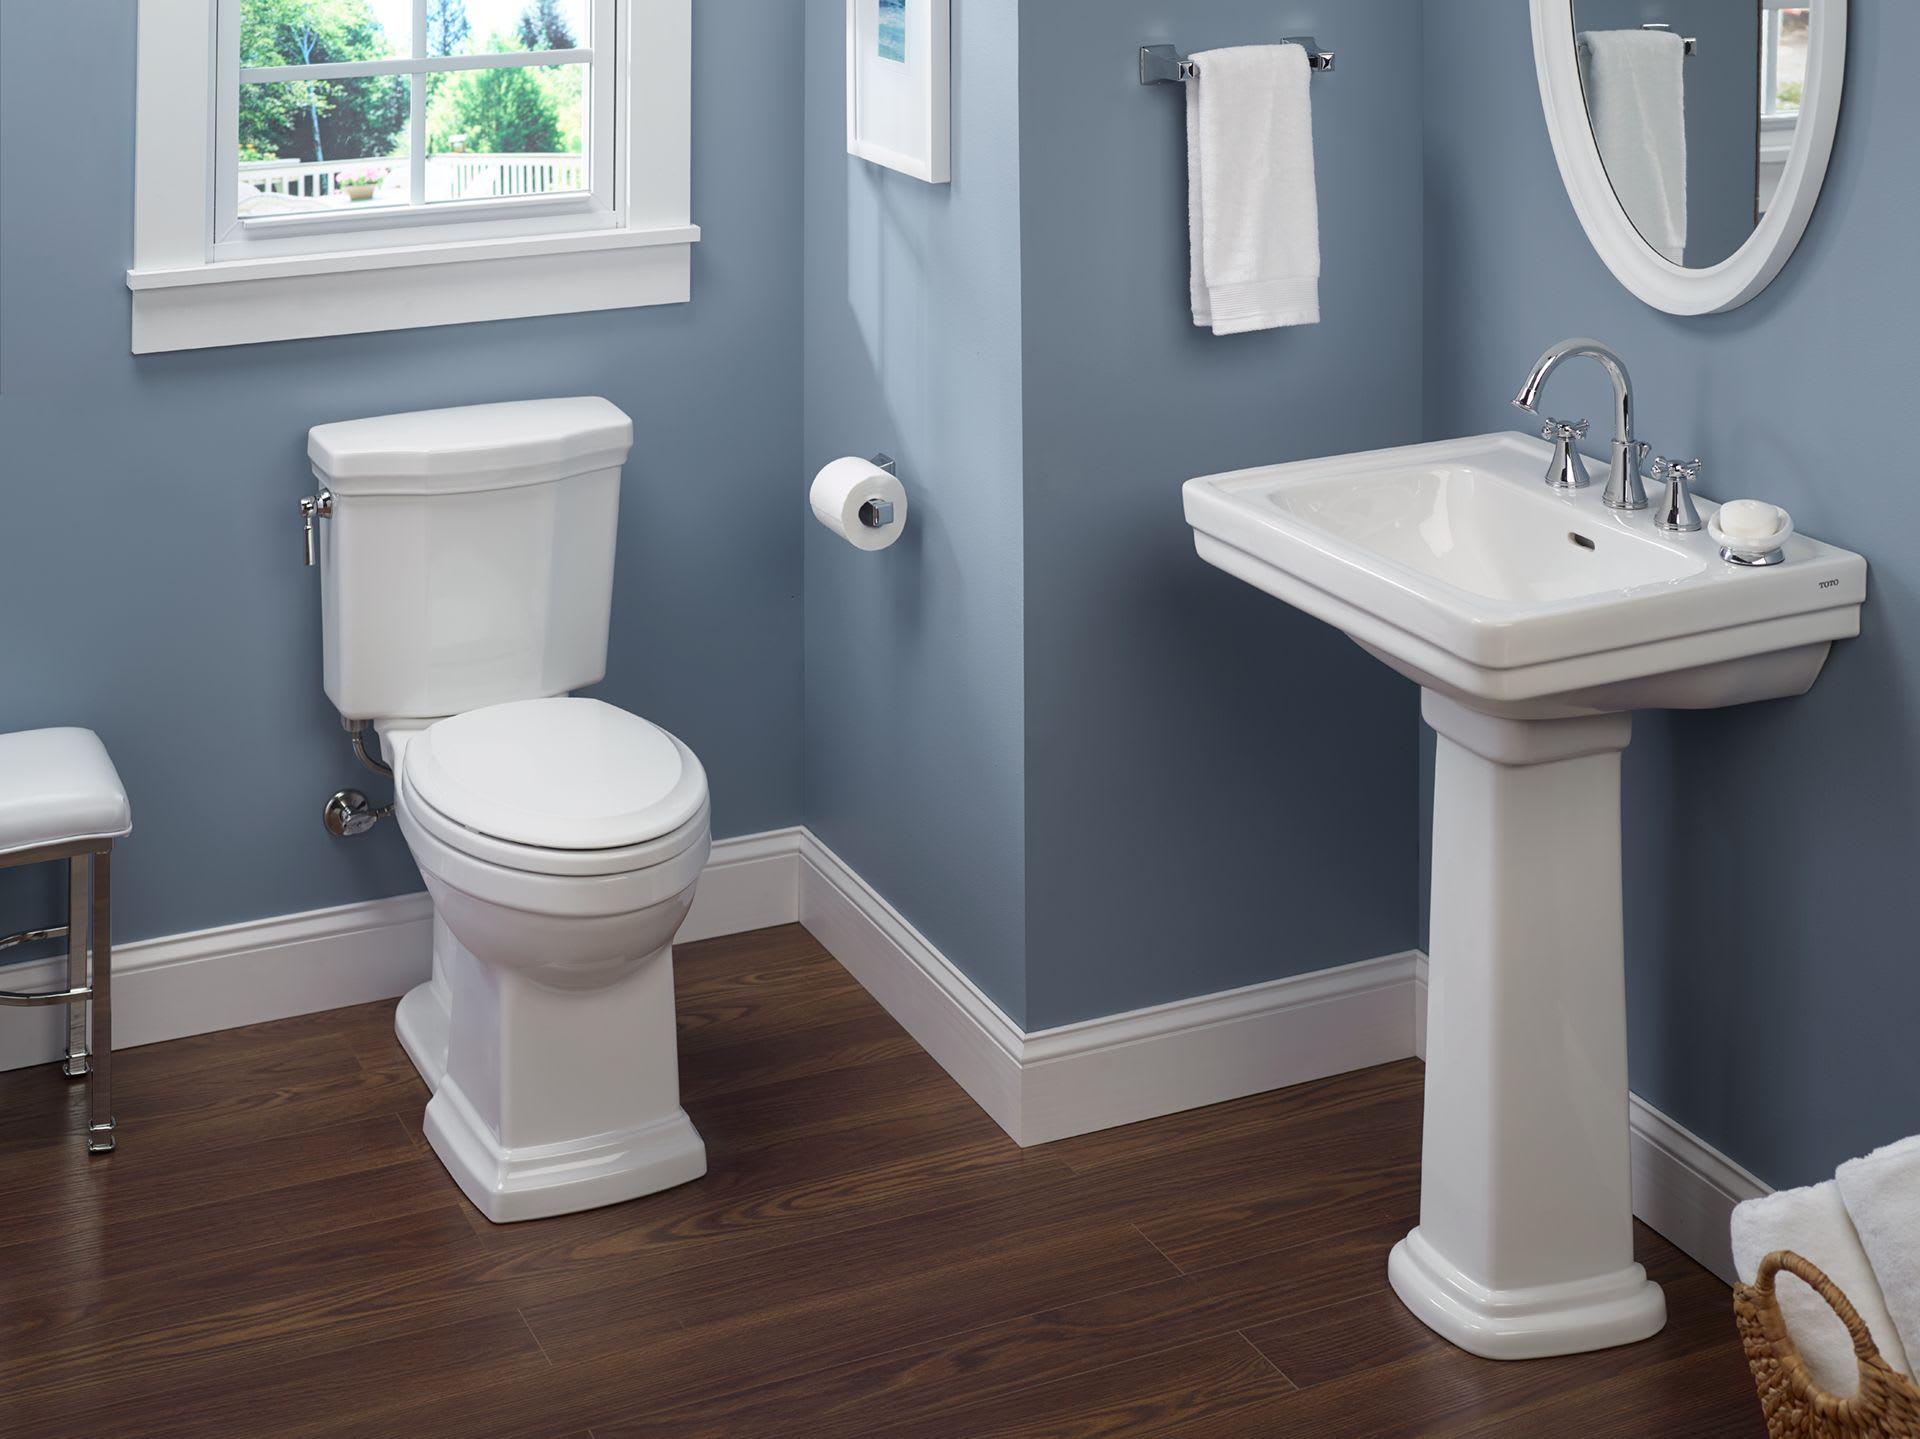 Toto Promenade Toilet Review | Zef Jam